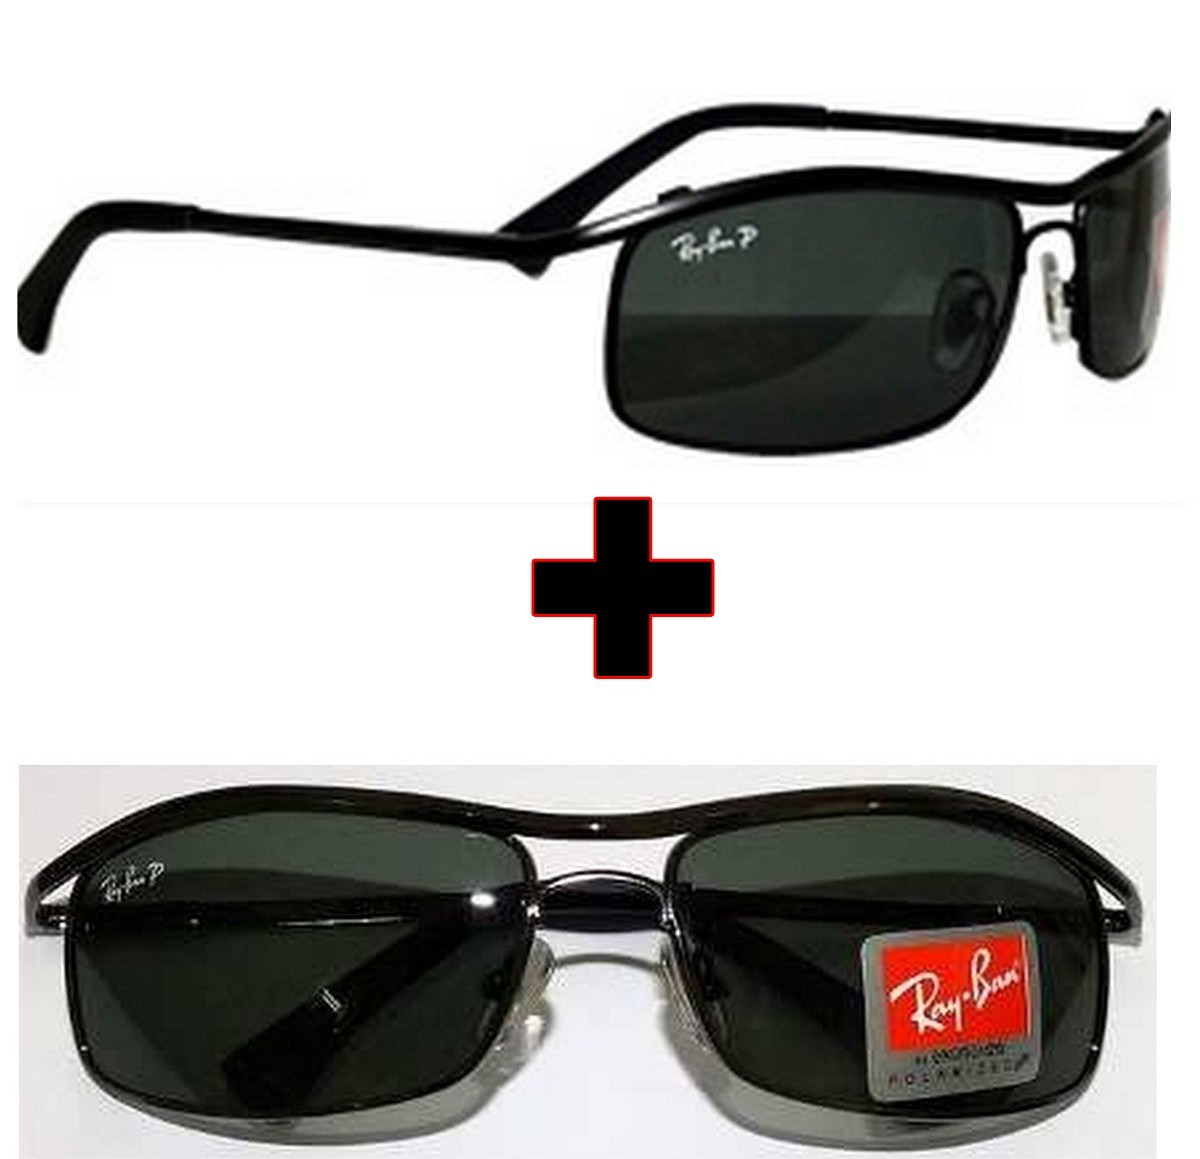 ca944621a55 Rb3339 Sunglasses « One More Soul